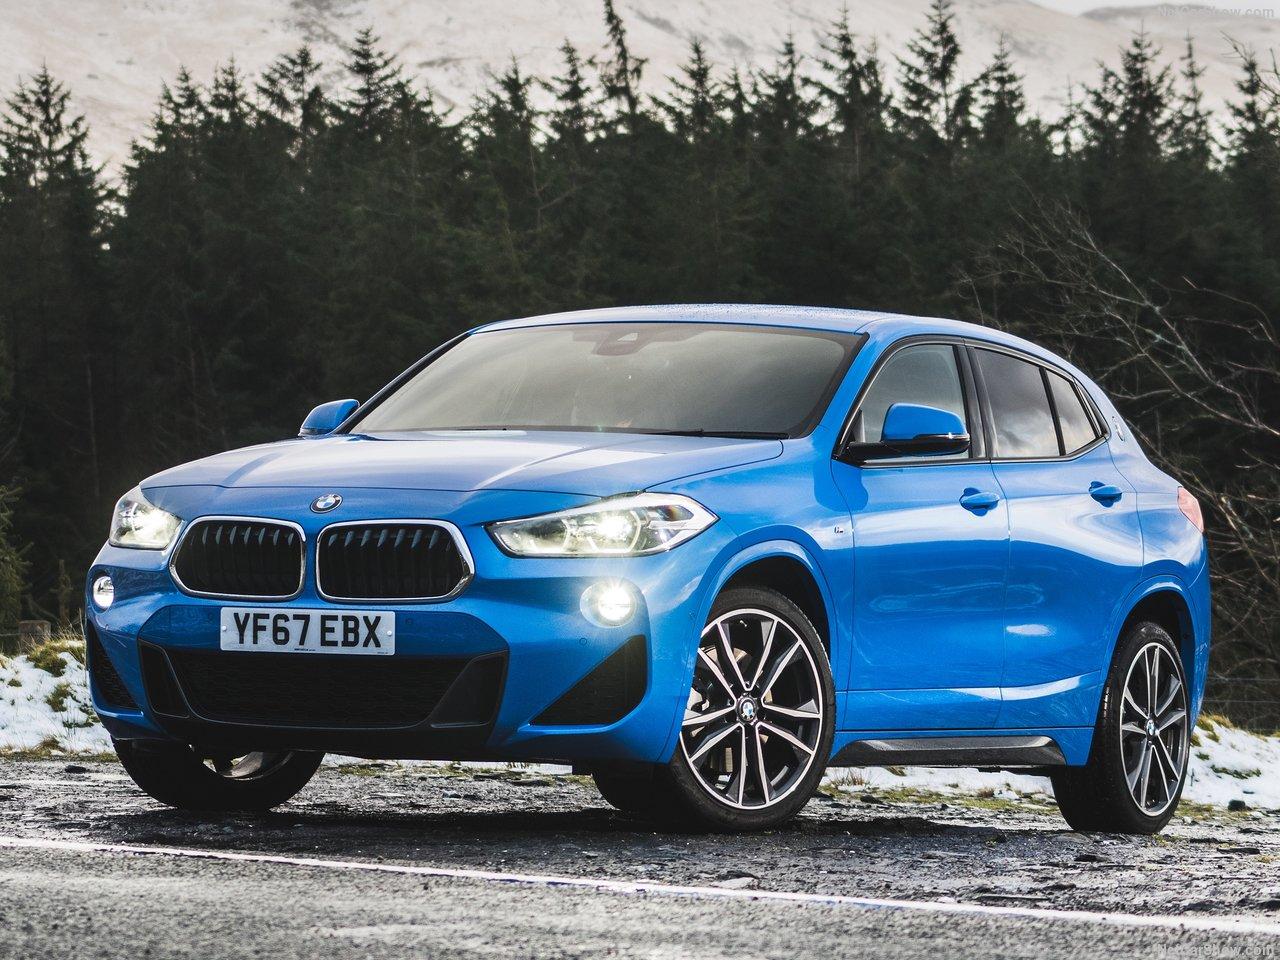 БМВ X2 Concept 2017 - фото и видео тест драйв комплектация характеристики нового BMW